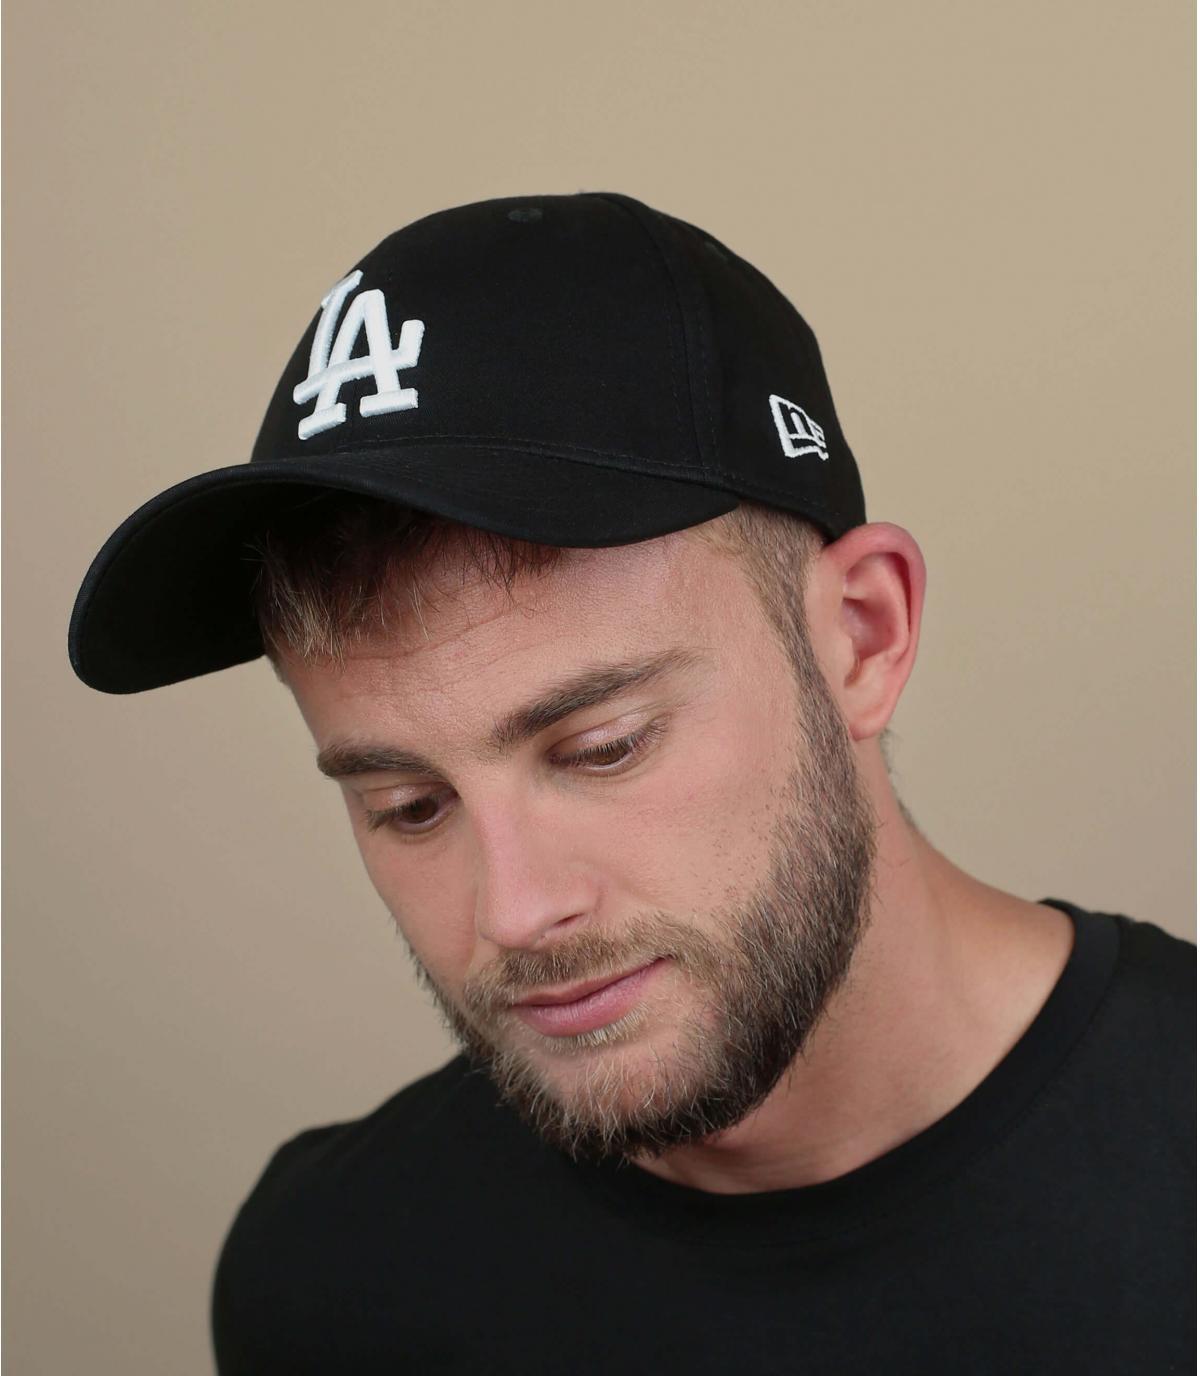 LA Black gebogen vizier cap